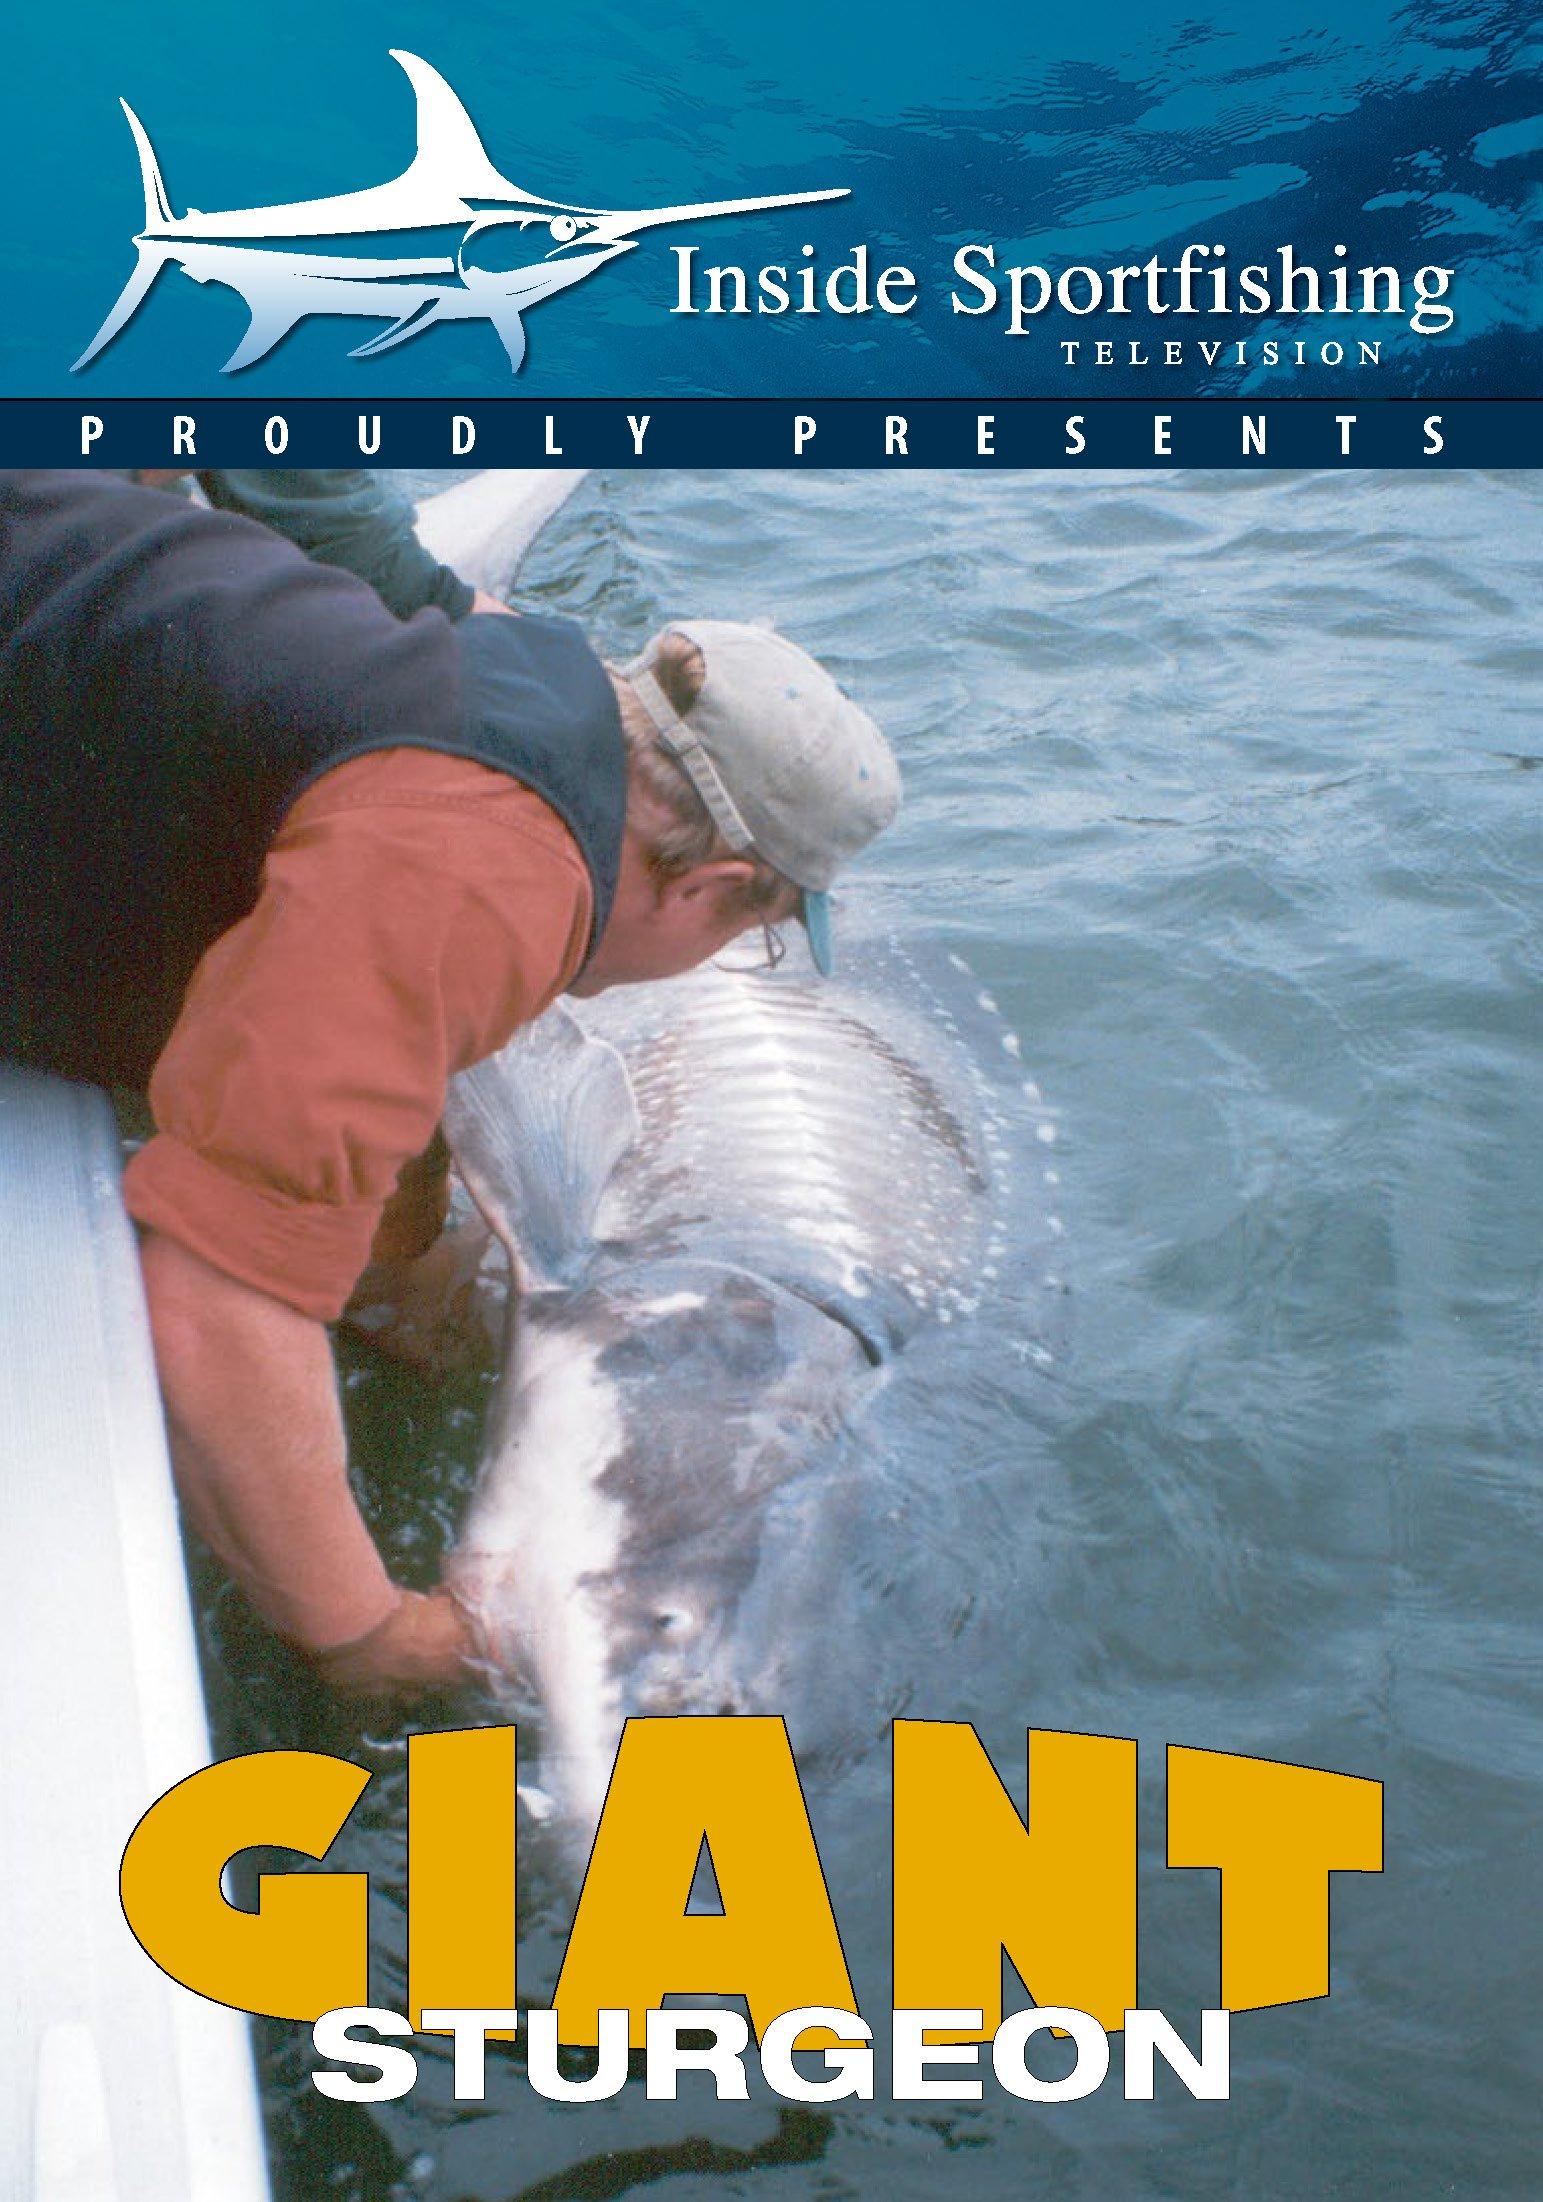 DVD : Inside Sportfishing: Giant Sturgeon (DVD)